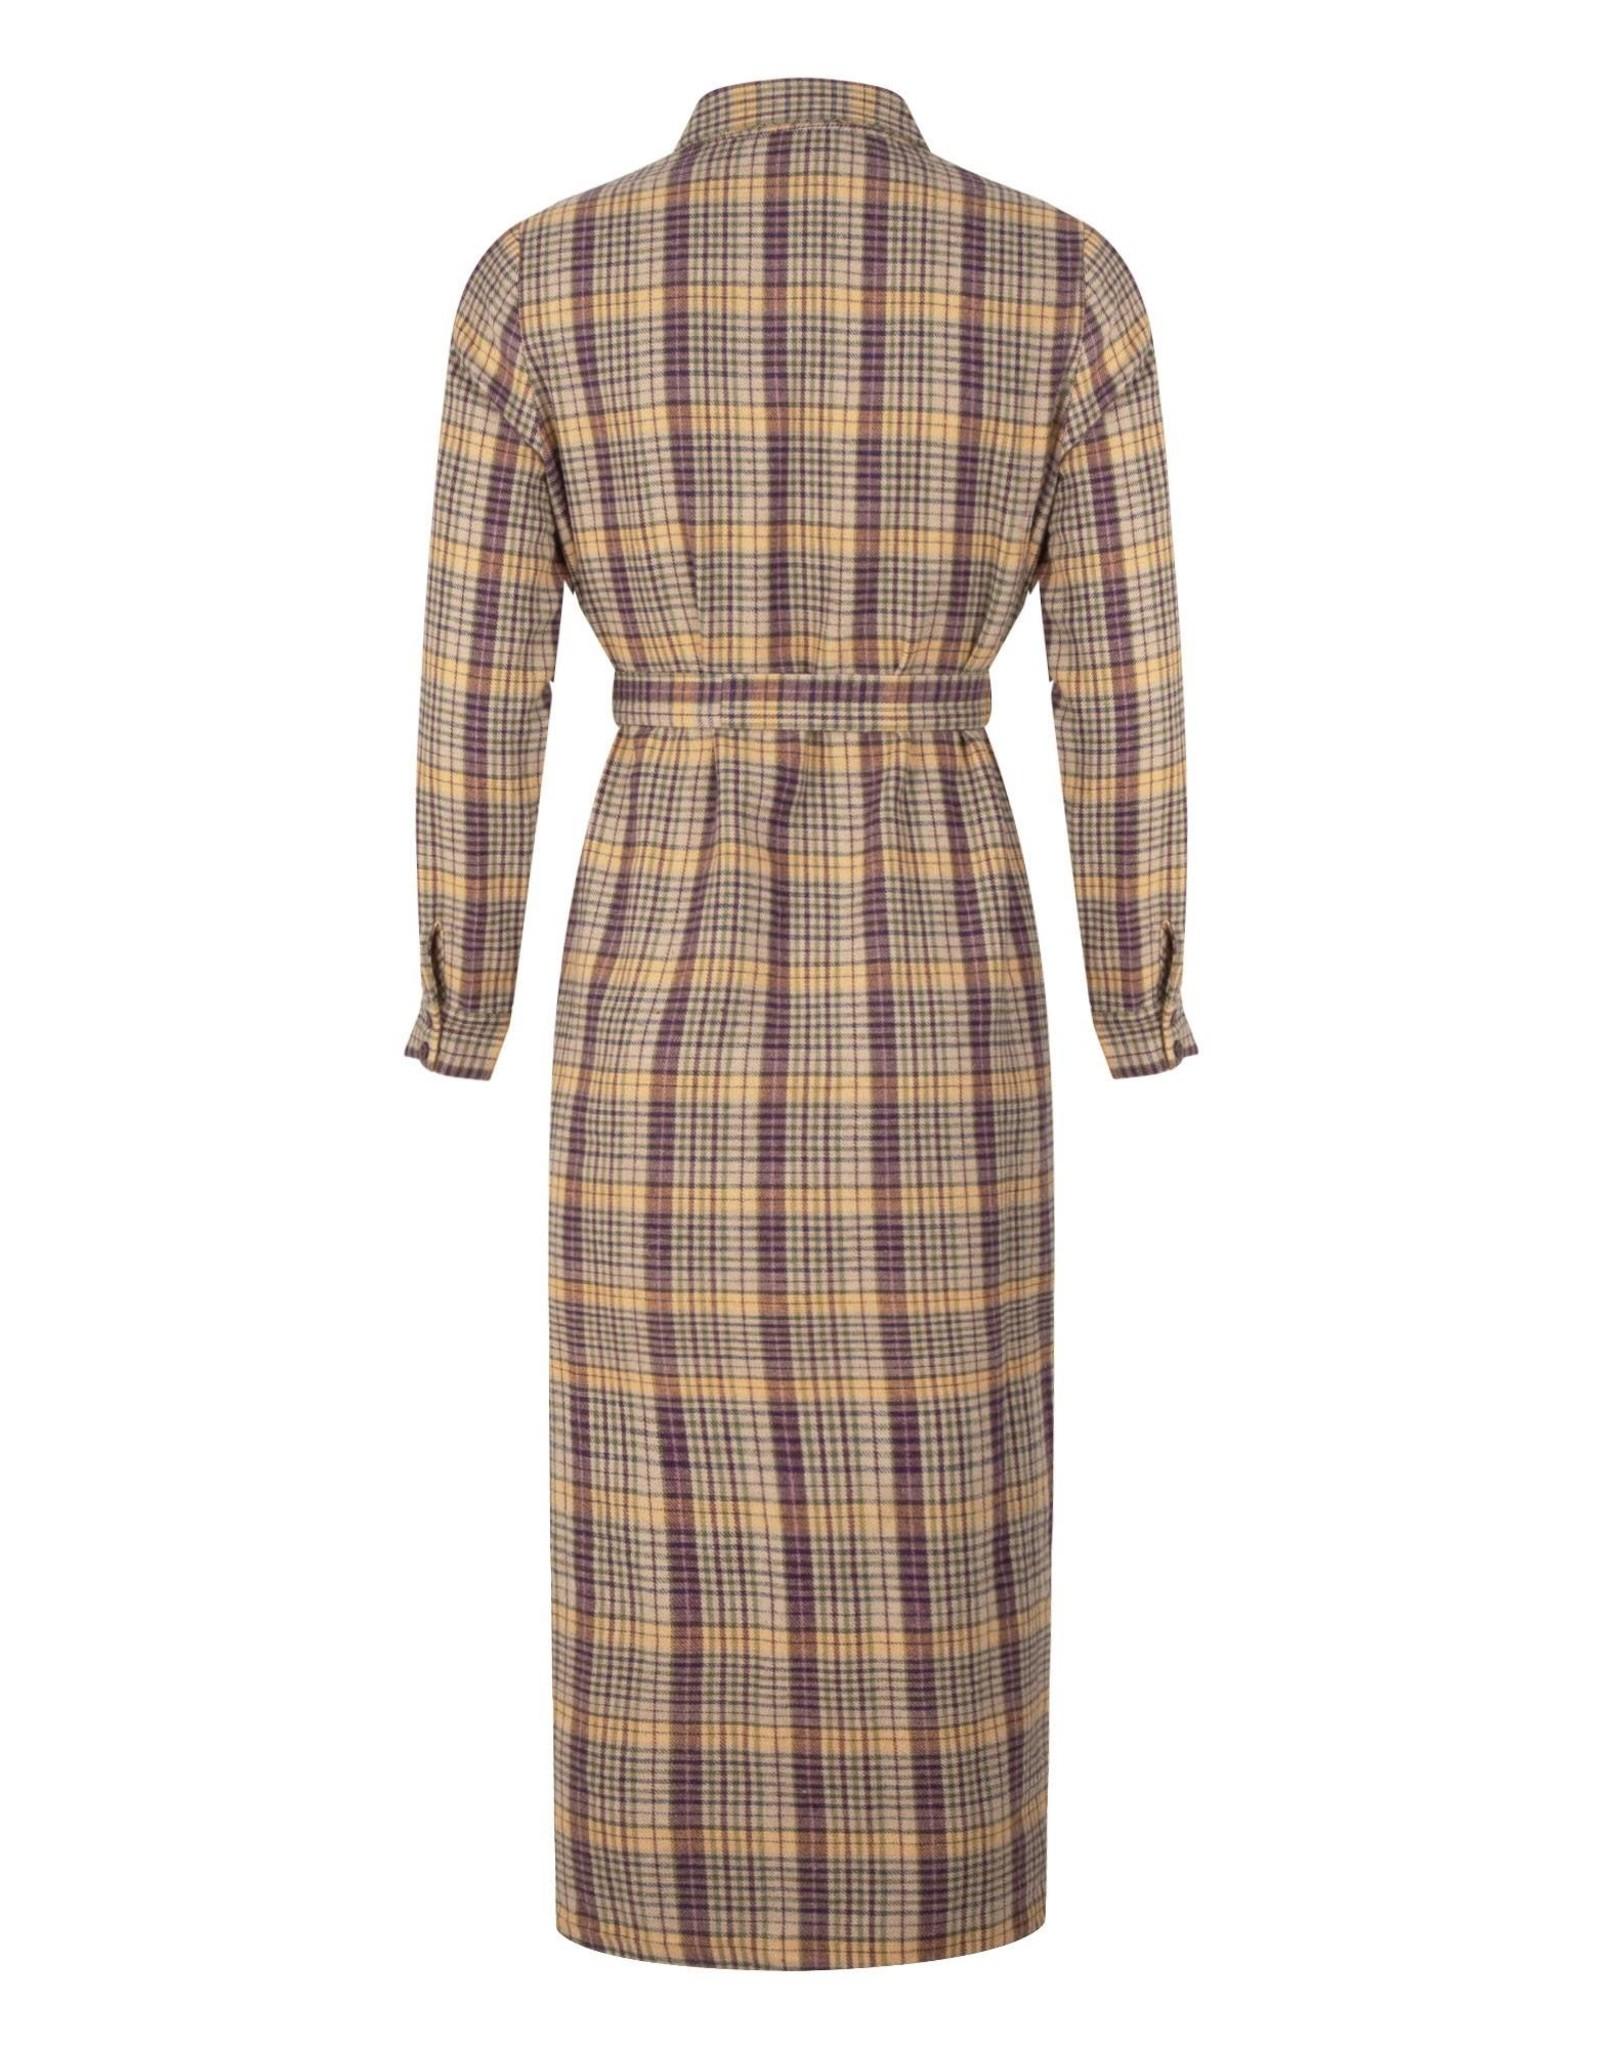 CHECK DRESS PURPLE